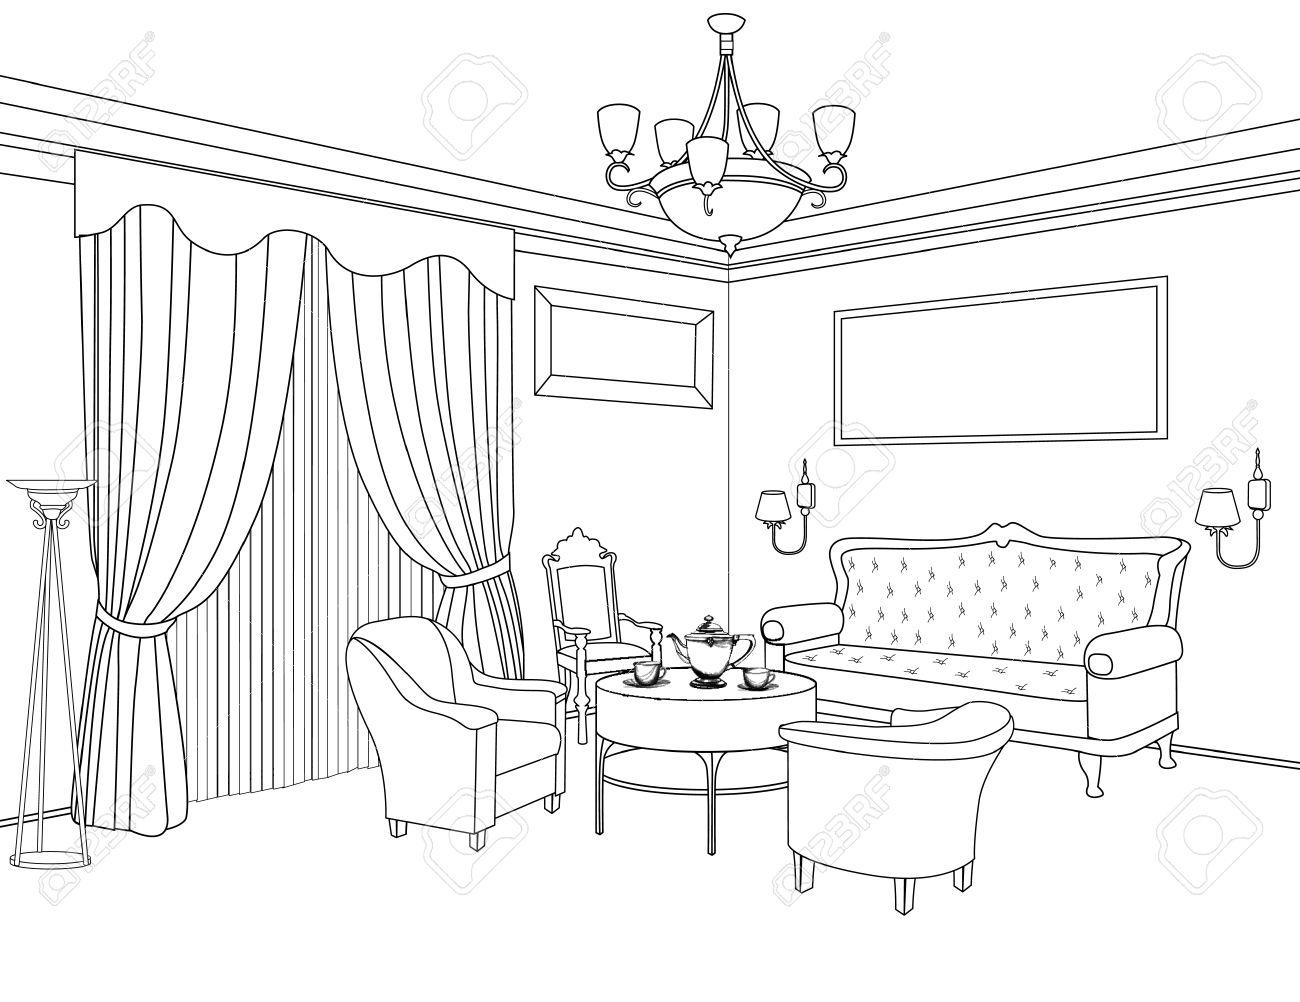 Interior outline sketch furniture blueprint architectural design furniture blueprint architectural design living room stock vector 33560763 malvernweather Images